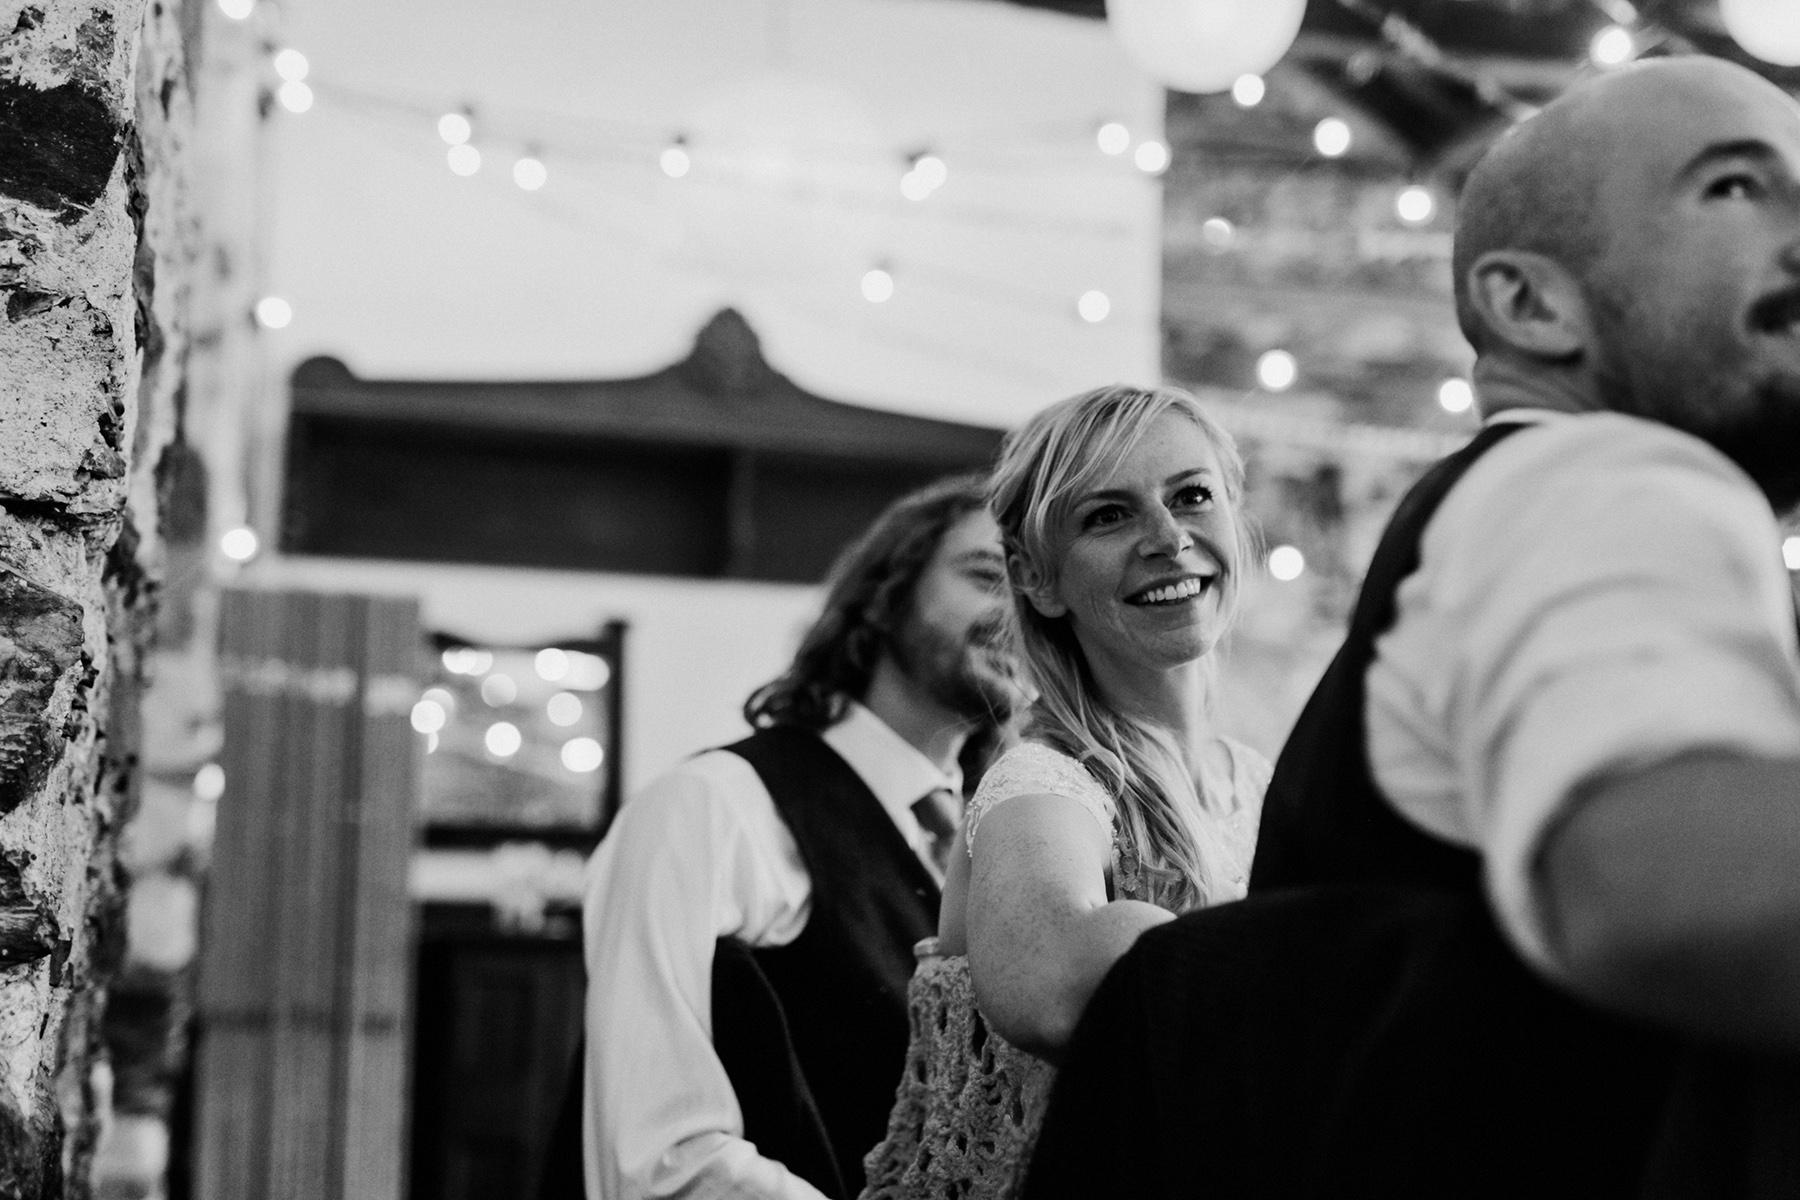 Snowdonia-Wales-Wedding-Photos-0383.jpg